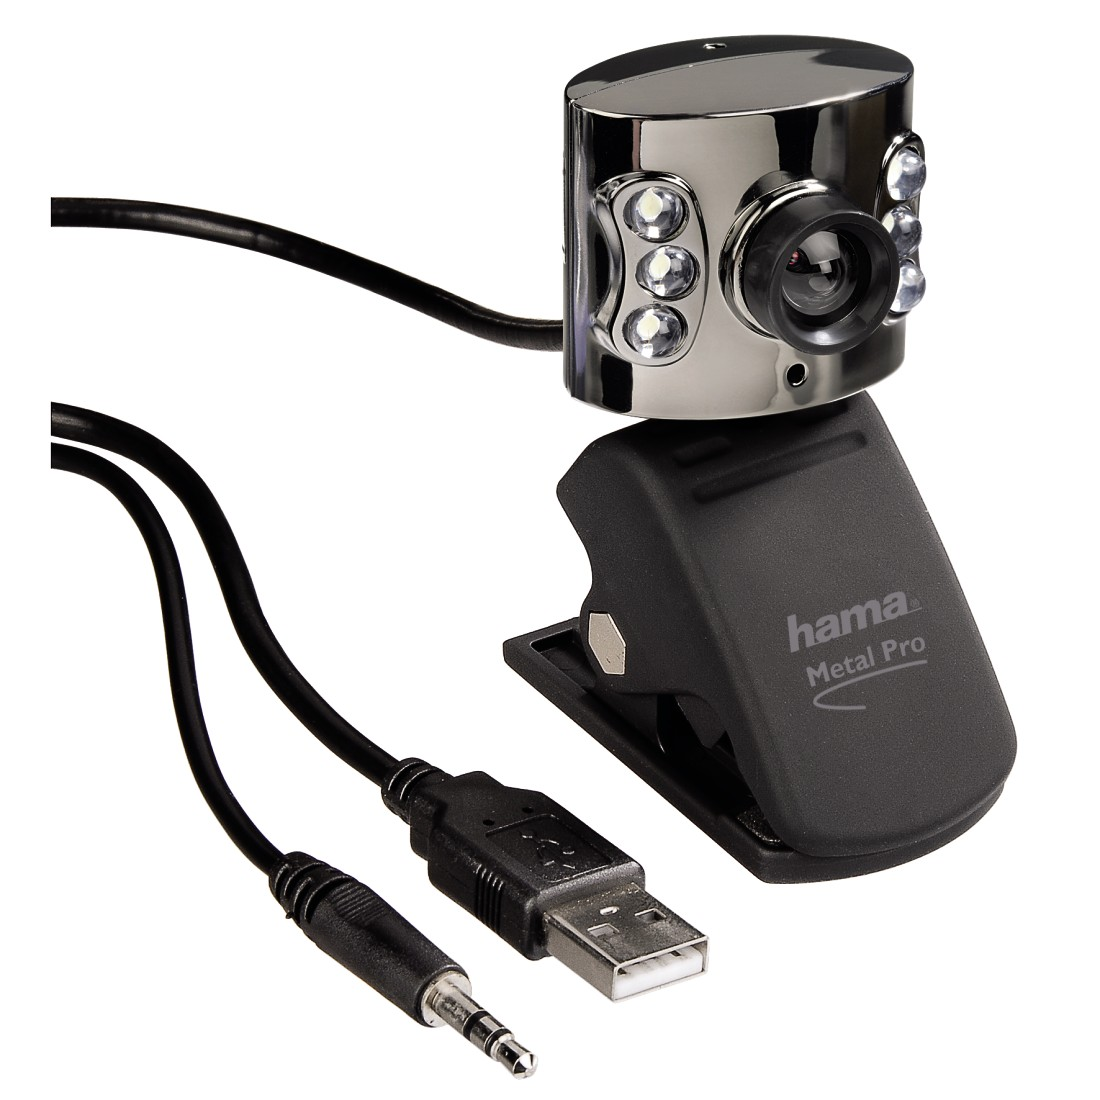 HAMA Metal Pro Webcam Windows 8 X64 Treiber